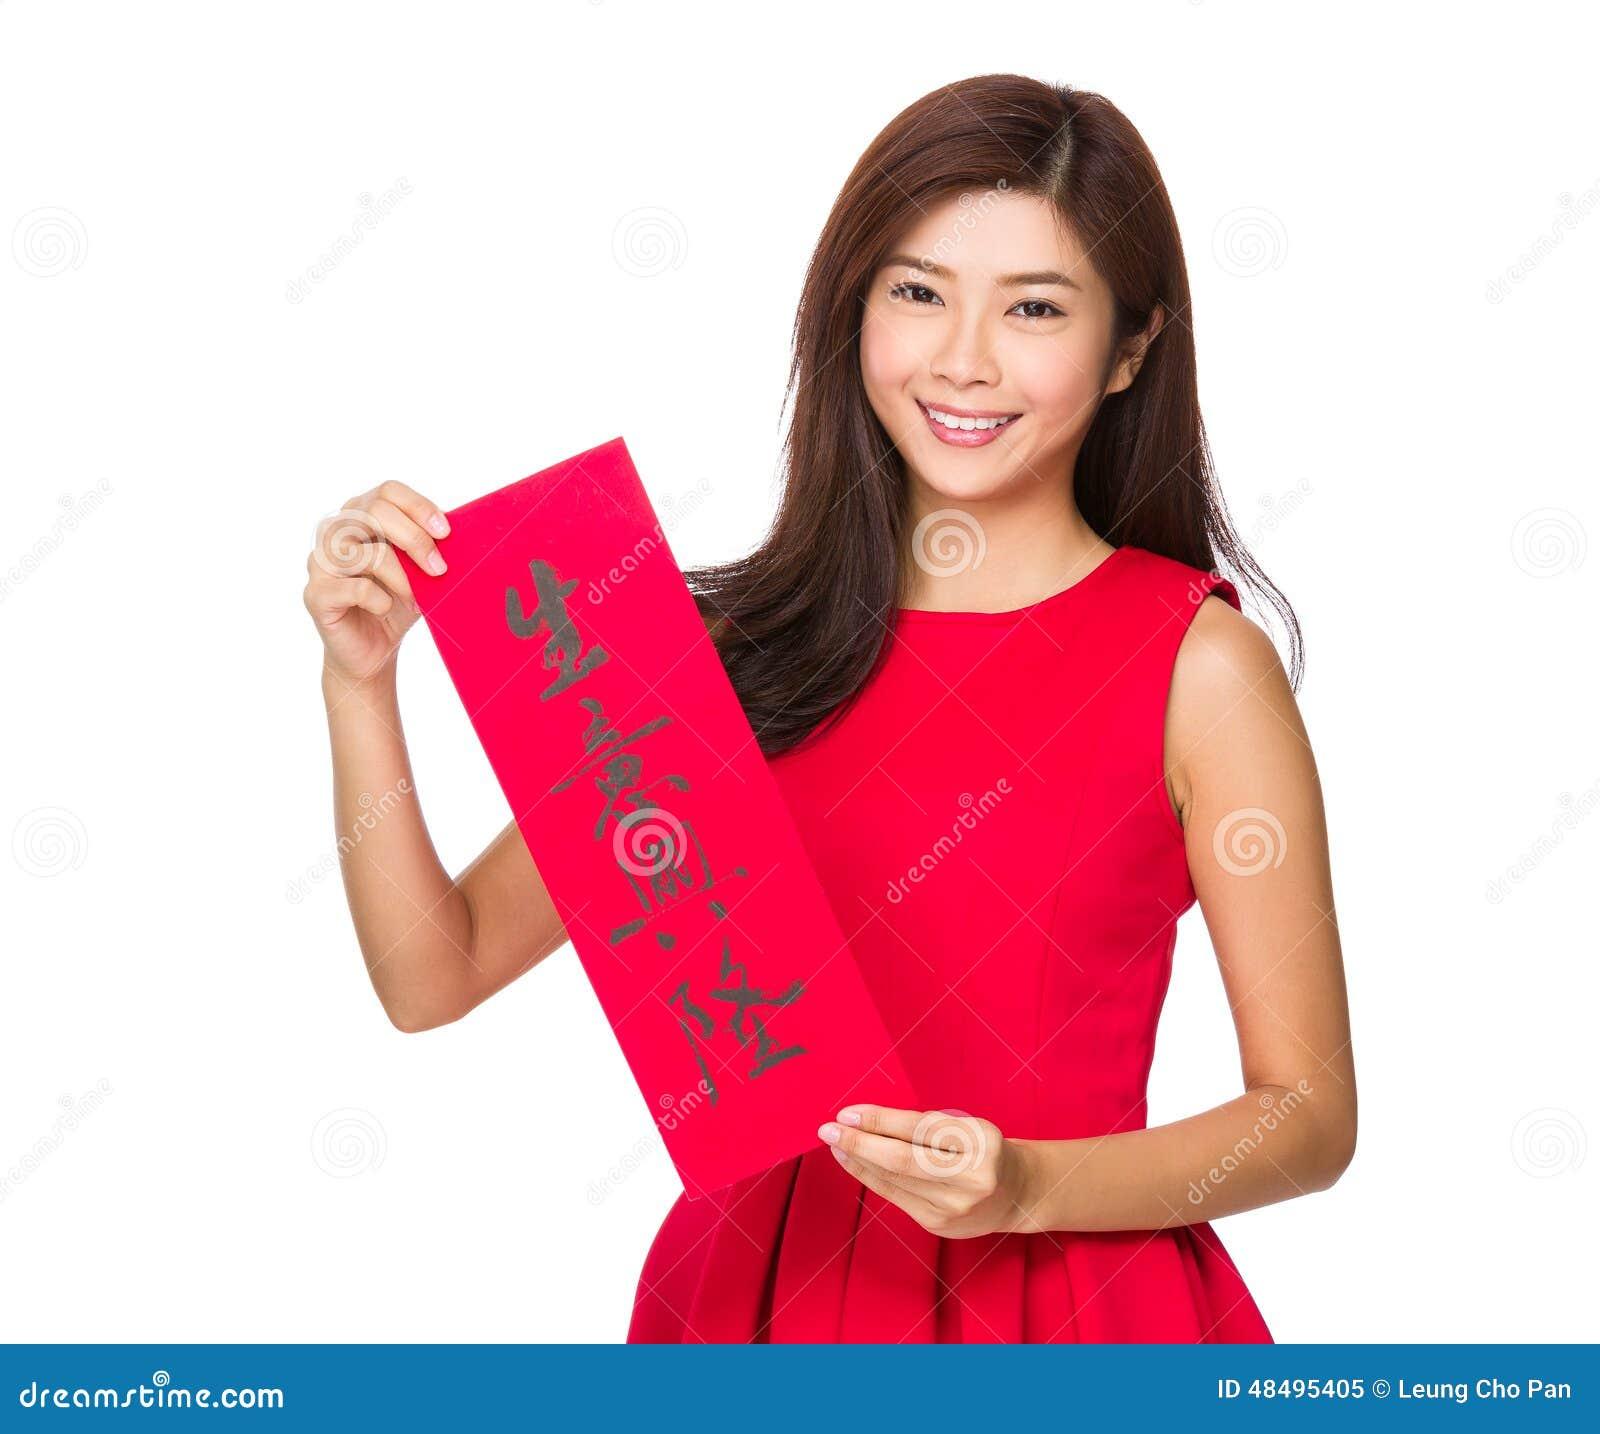 Fai chun writing a business